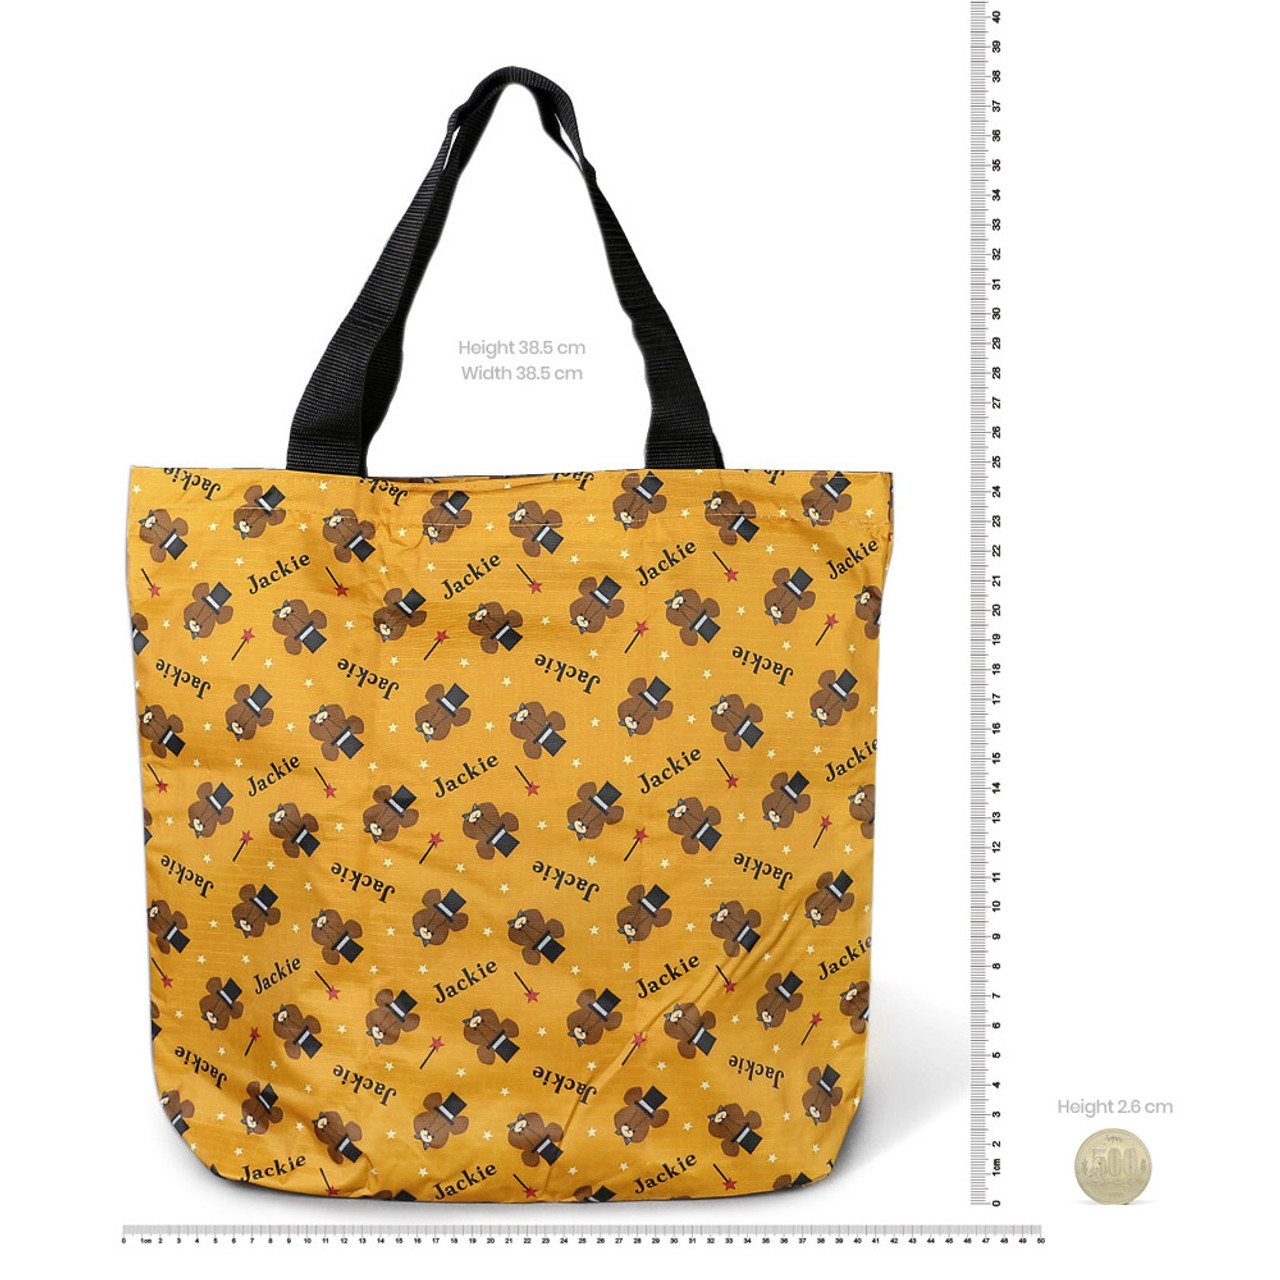 The Bears' School Jackie Shopping Bag - Brown ( Tota Bag Mode Proportion )